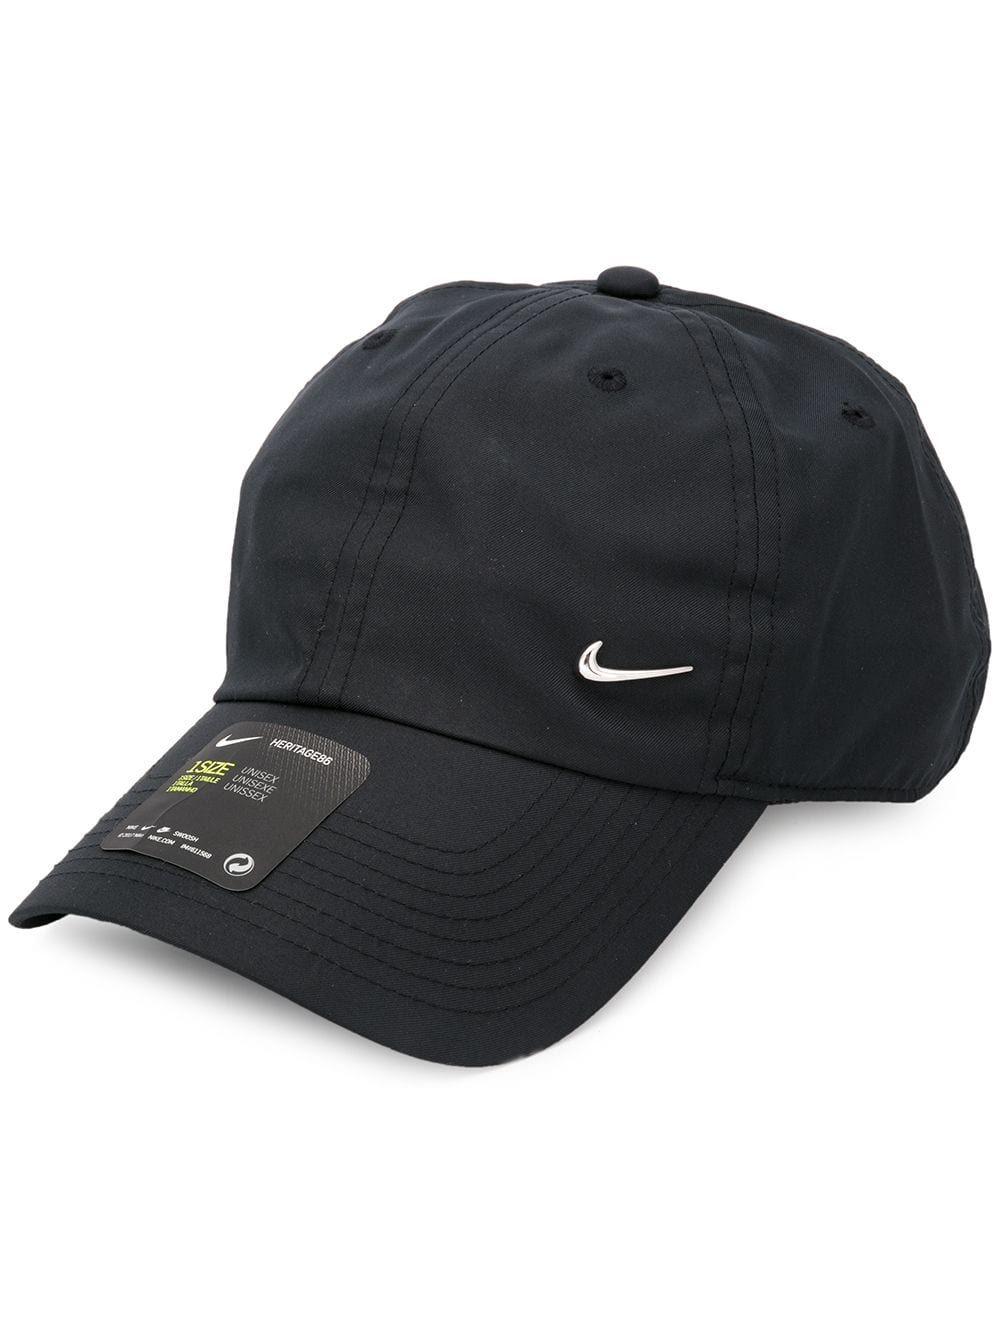 aee5326b8e9f4e NIKE NIKE METAL SWOOSH H86 CAP - BLACK. #nike | Nike in 2019 | Nike ...